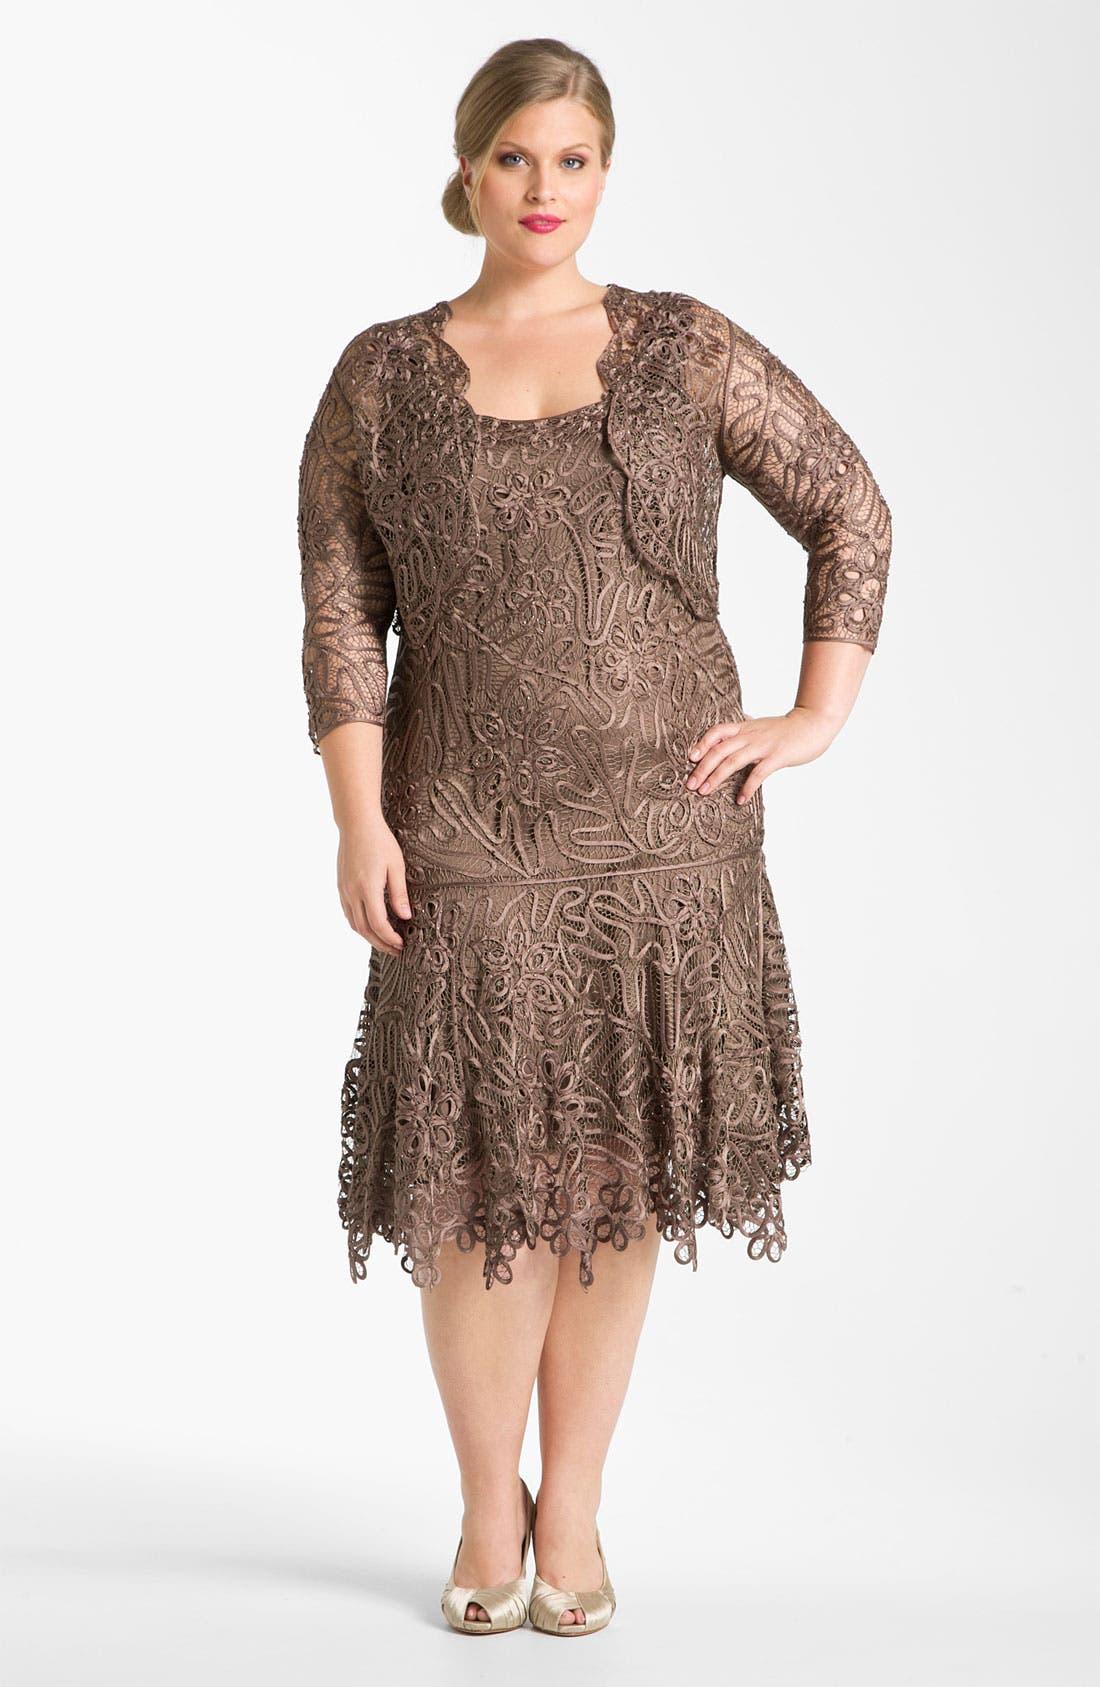 Alternate Image 1 Selected - Soulmates Beaded Crochet Silk Dress & Bolero (Plus)